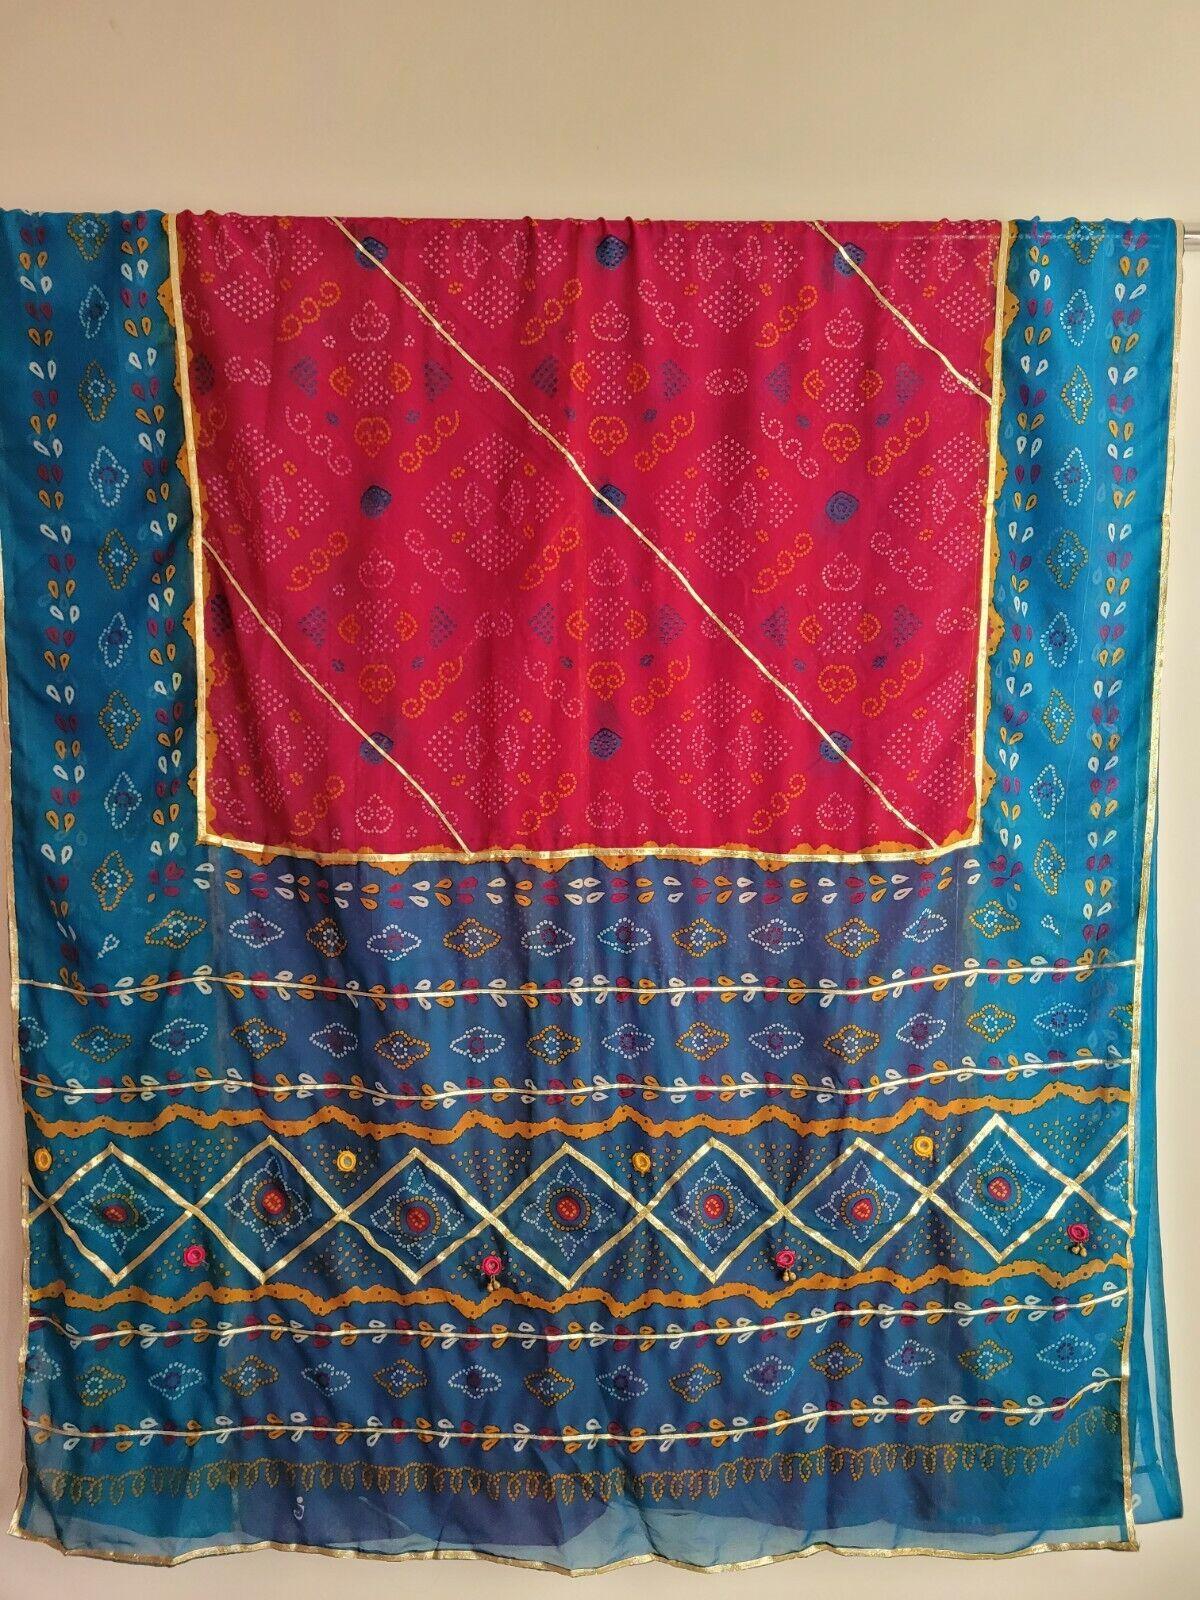 Colourful Sari Saree Indian Chiffon Everyday wear Bandhej Traditional Ethnic